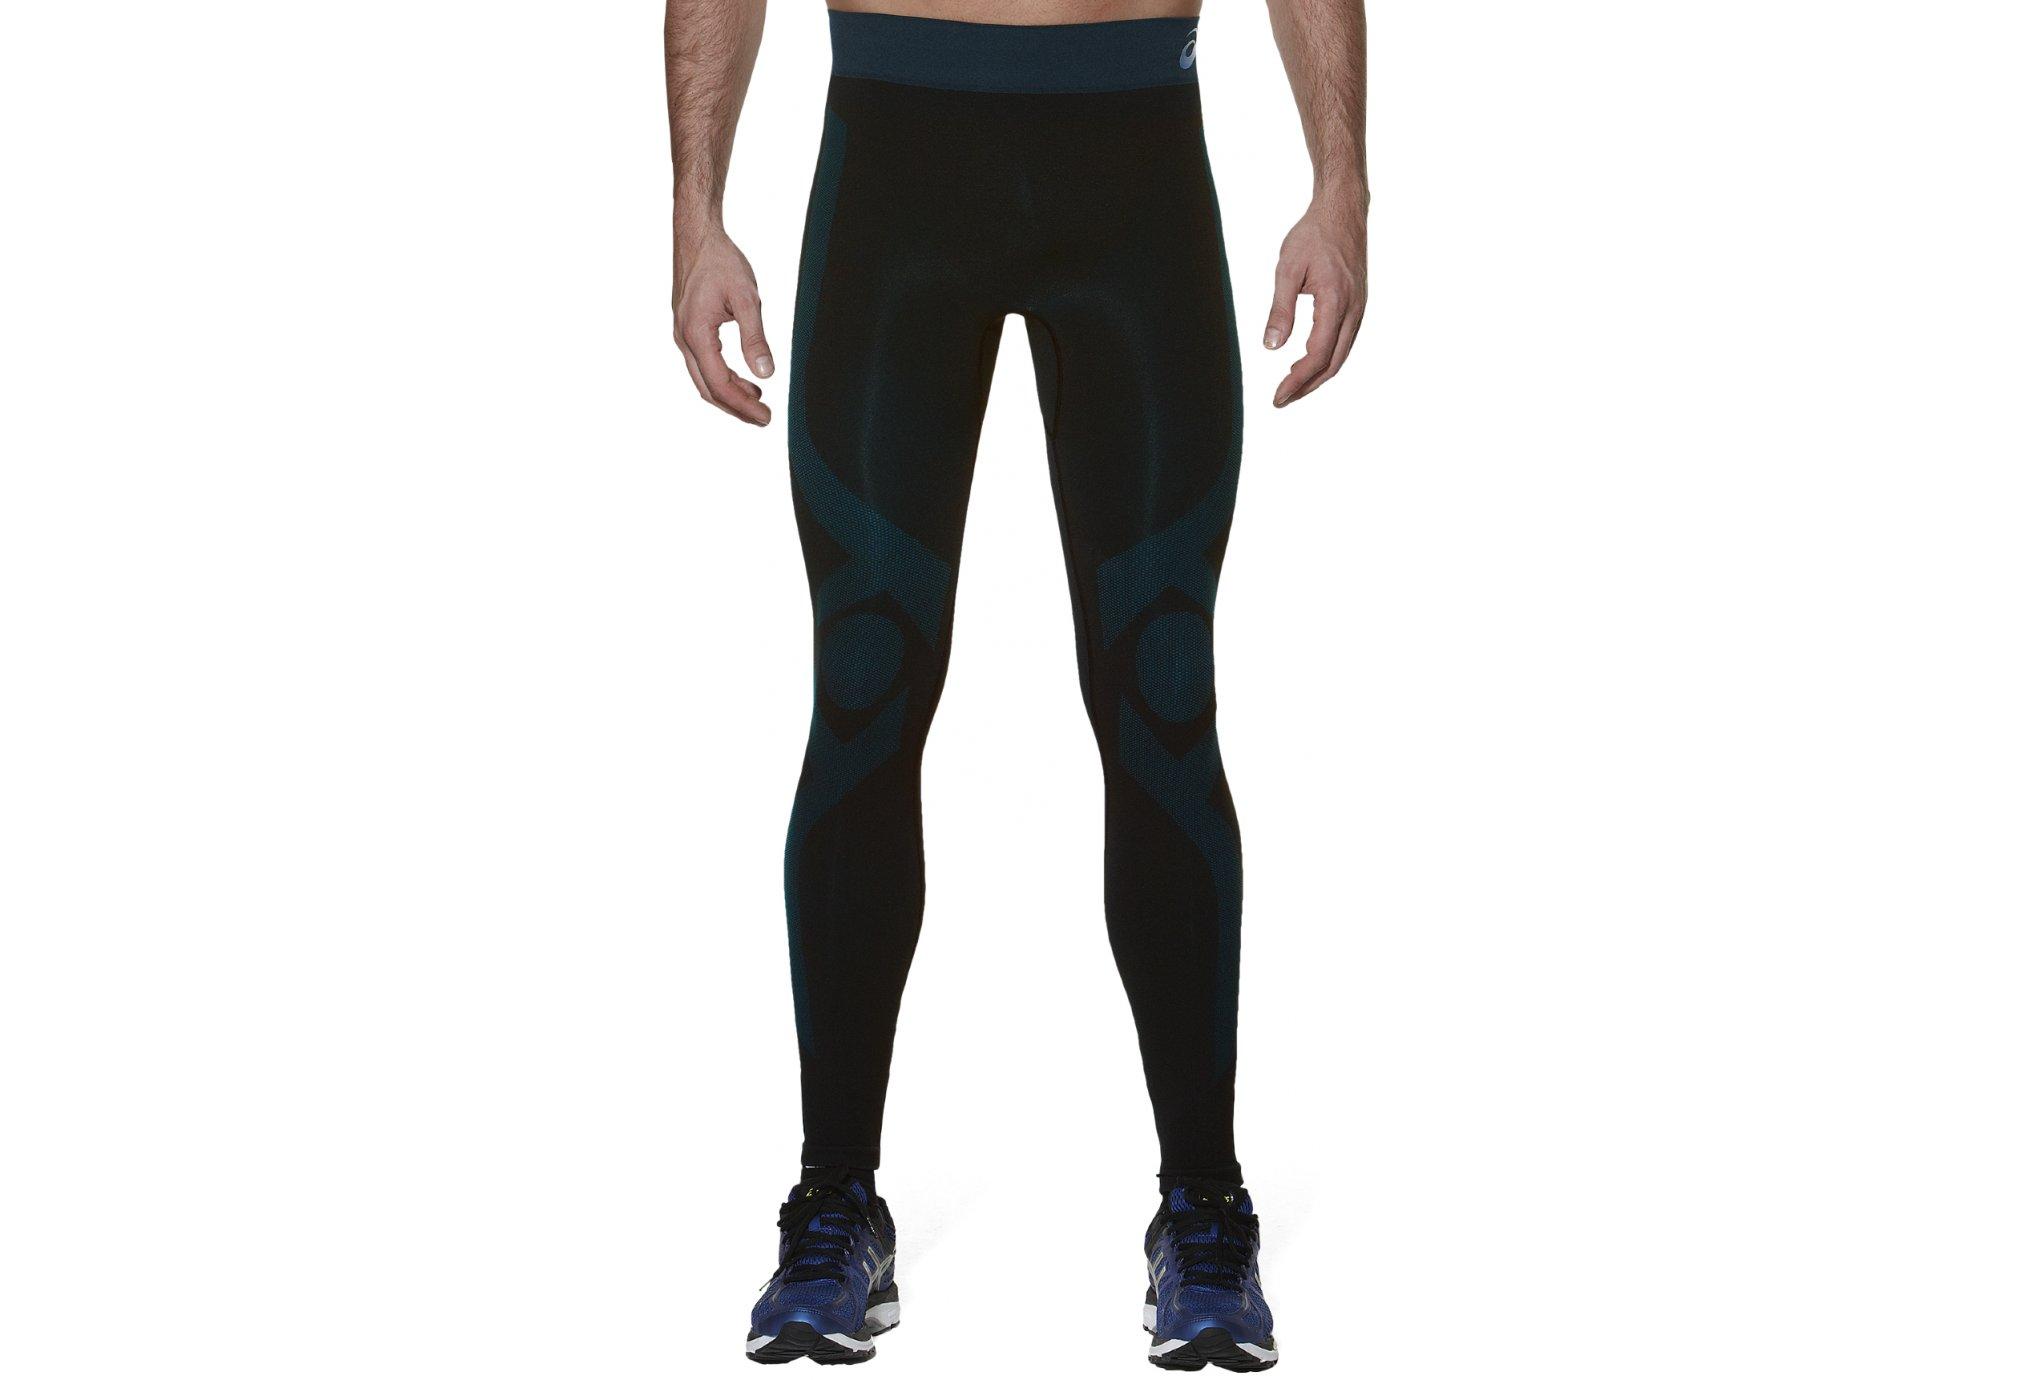 Asics Collant de compression seamless m vêtement running homme